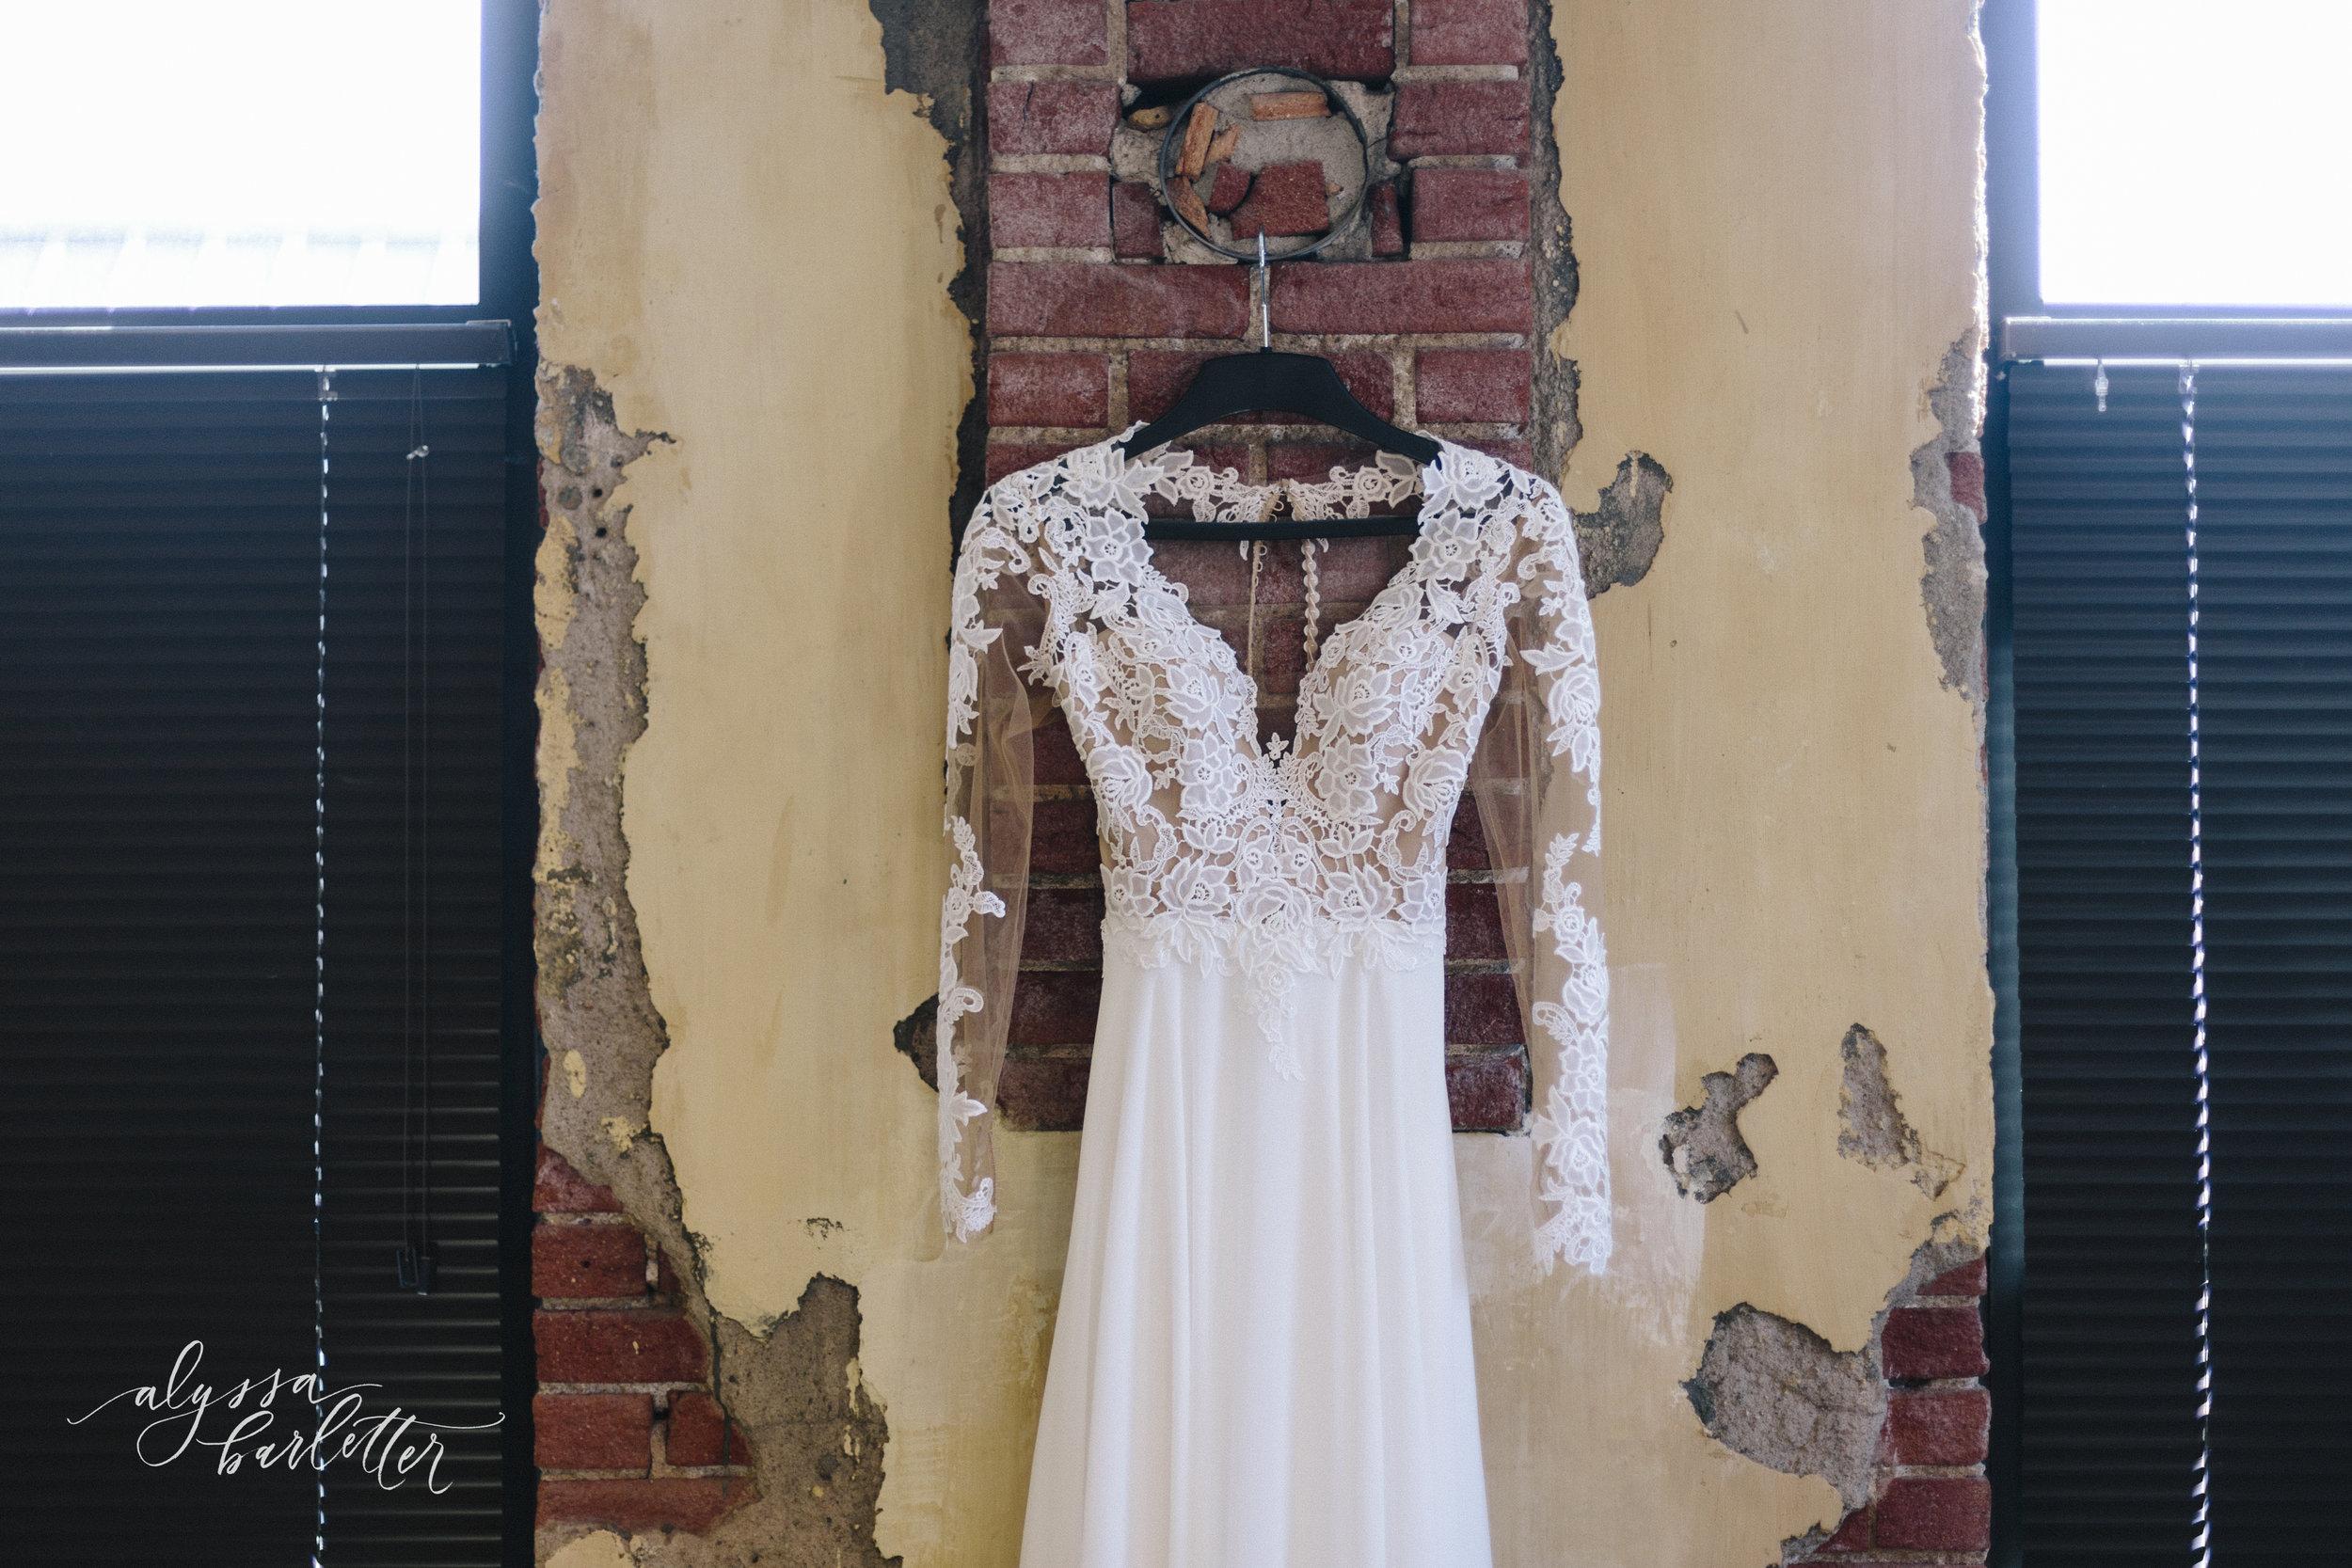 alyssa barletter photography kansas city spring wedding 28 event space courtney and zach-1-2.jpg